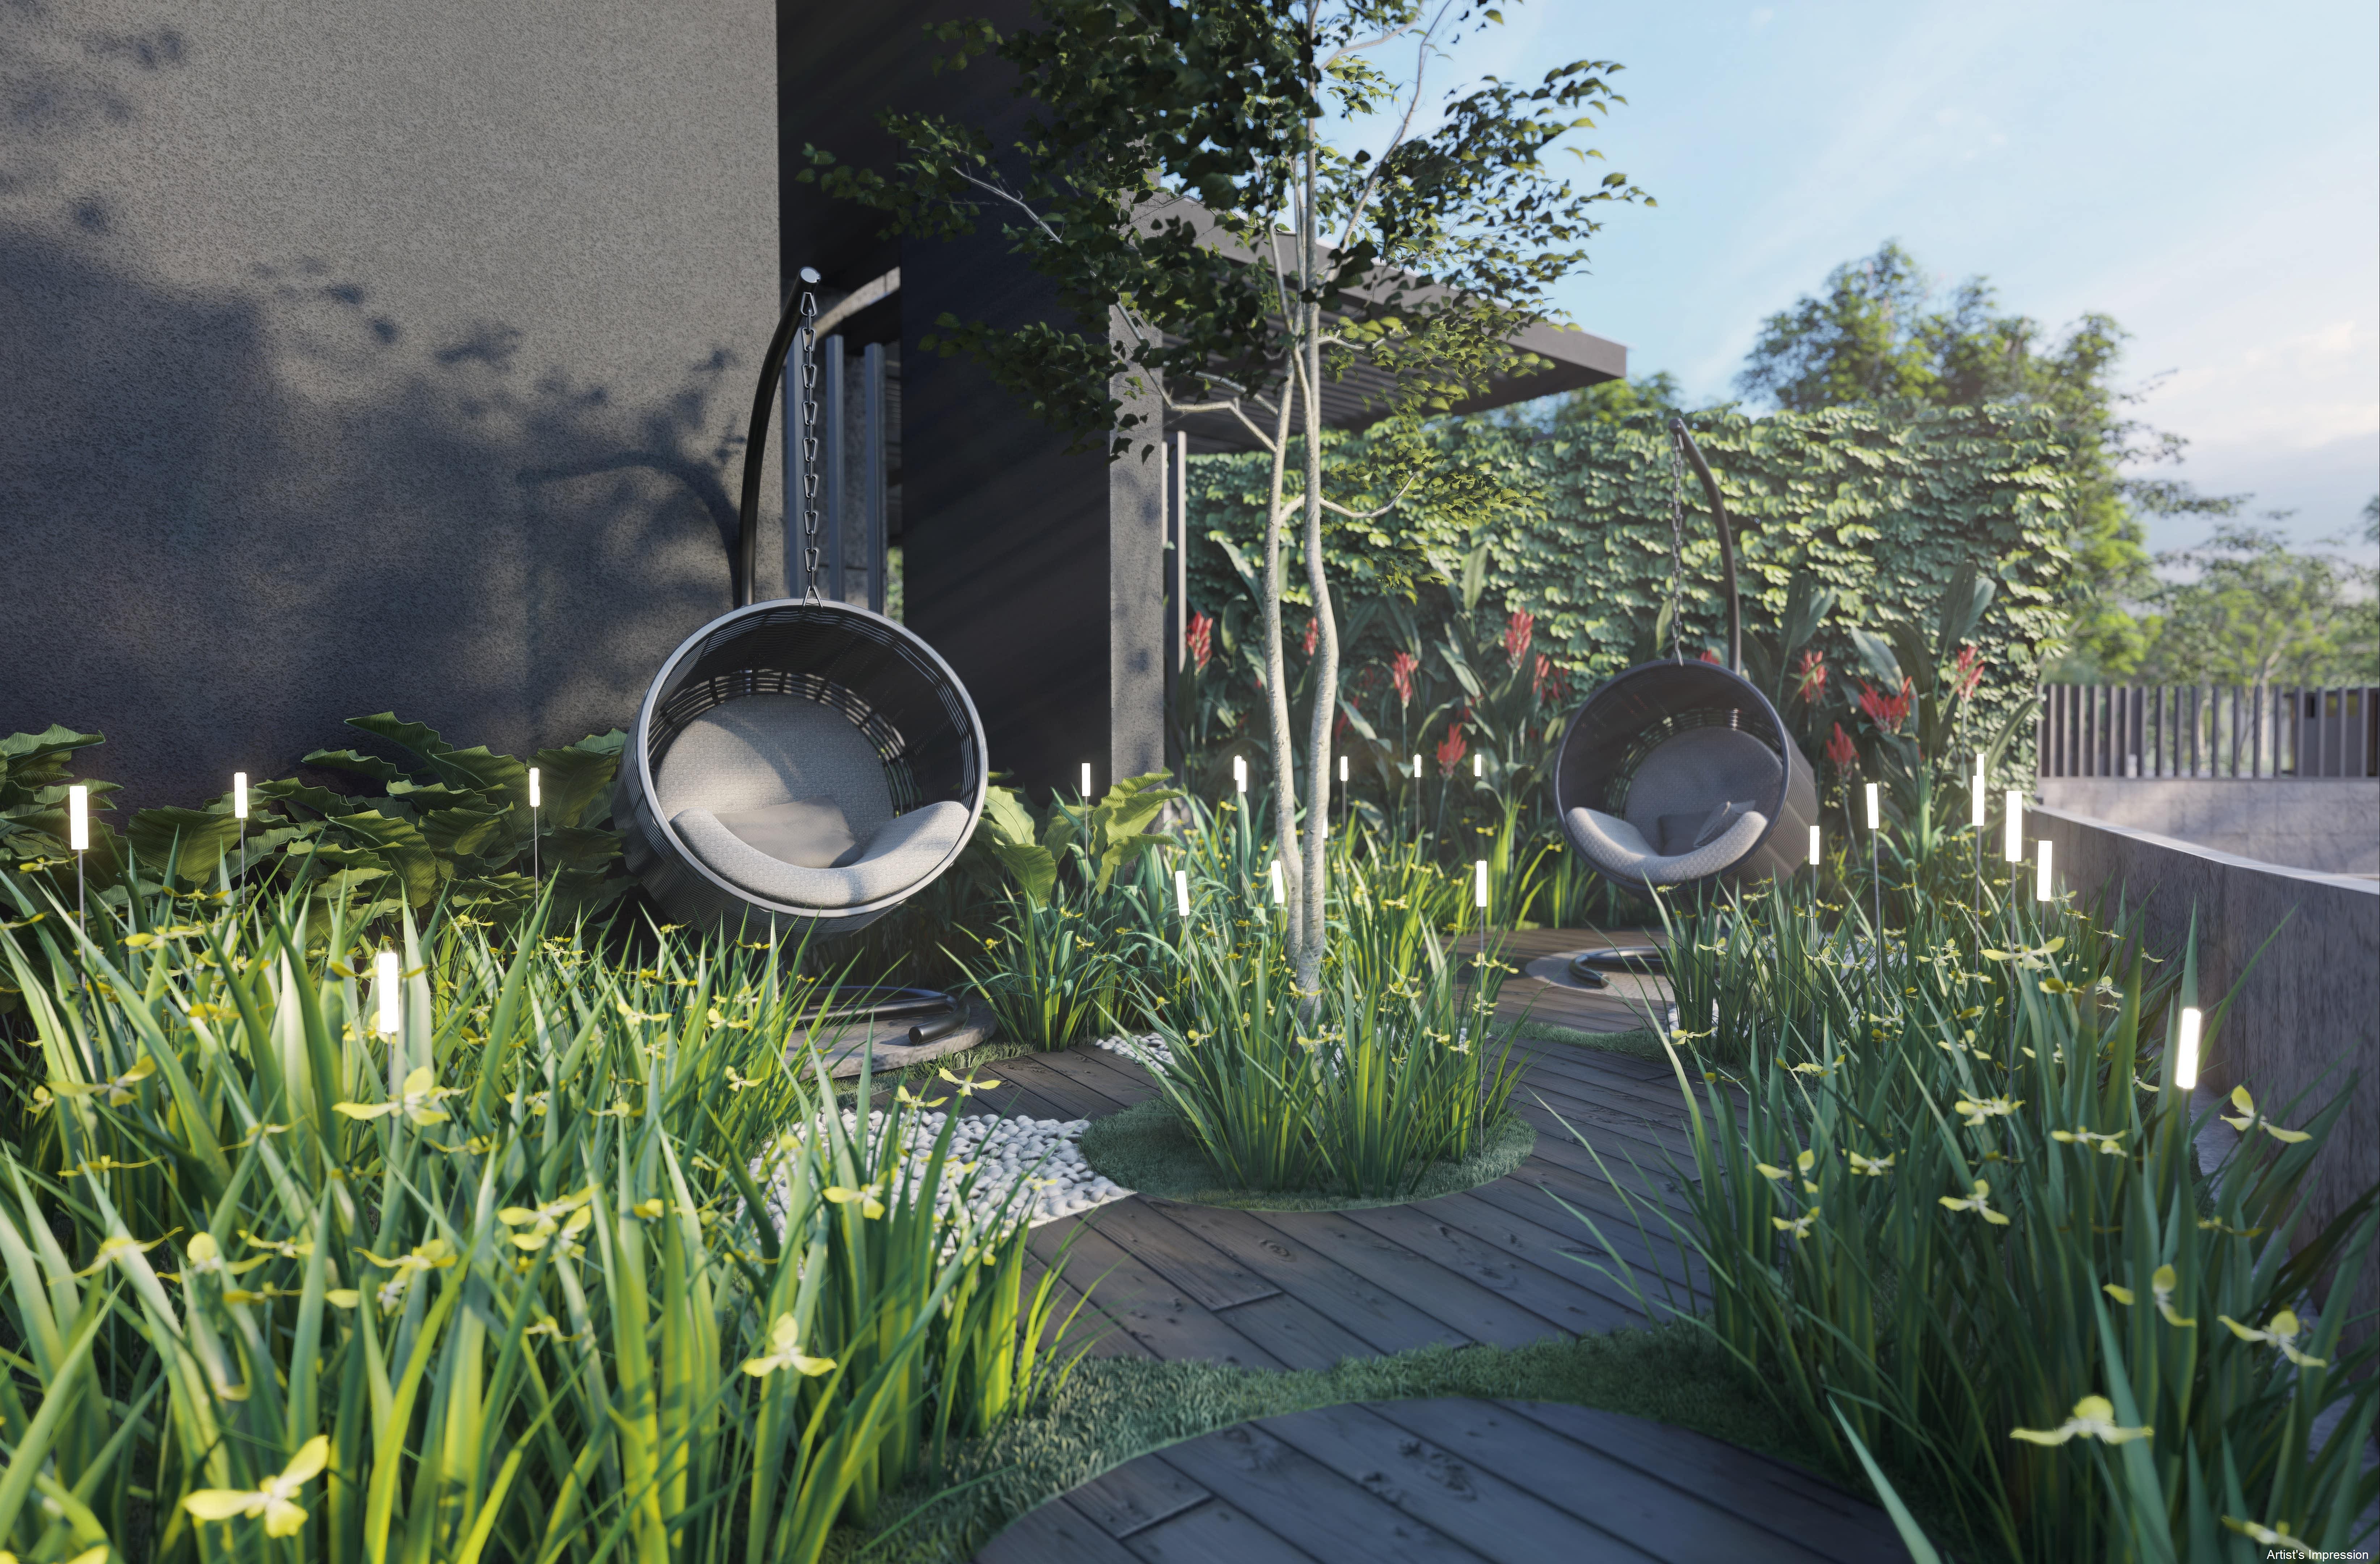 fyve derbyshire wellness garden